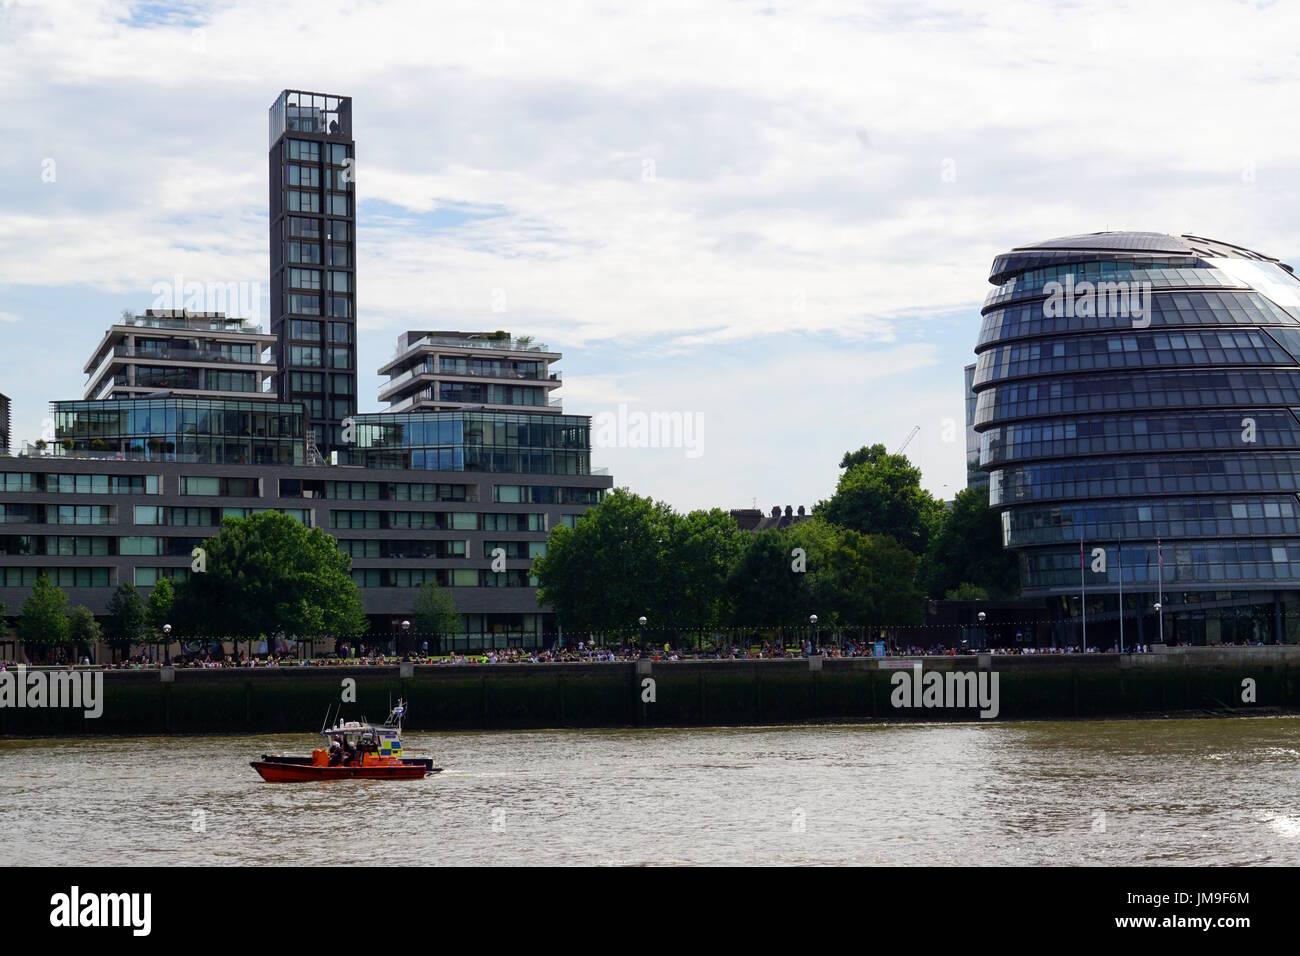 City Hall, London, United Kingdom - Stock Image